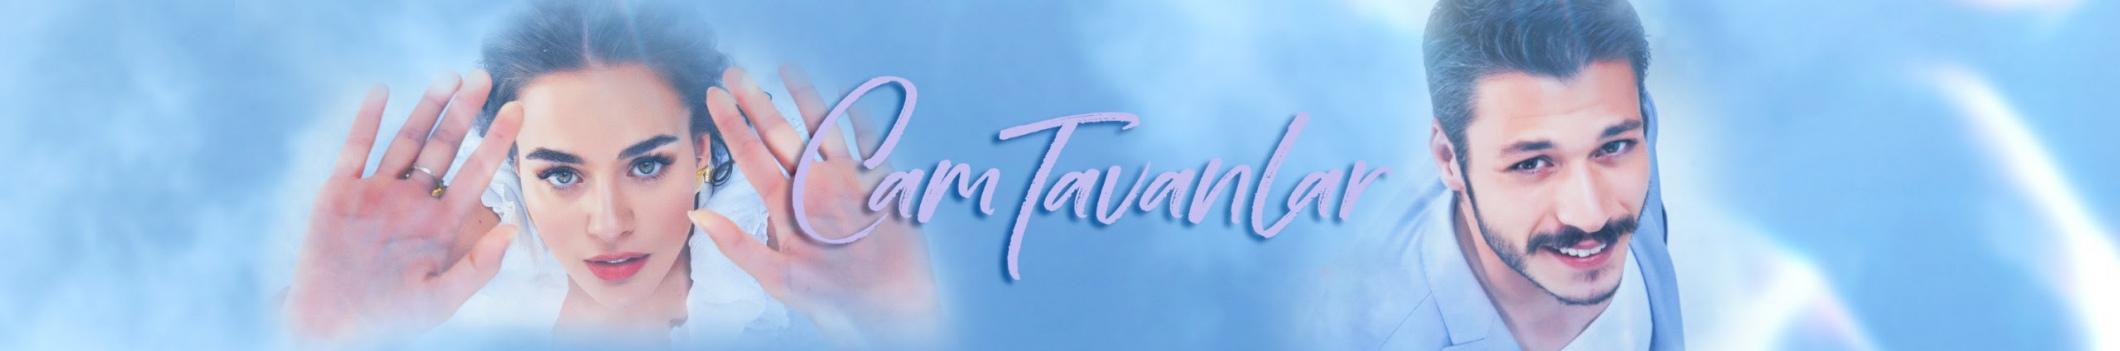 Cam Tavanlar English subtitles | Glass Ceilings